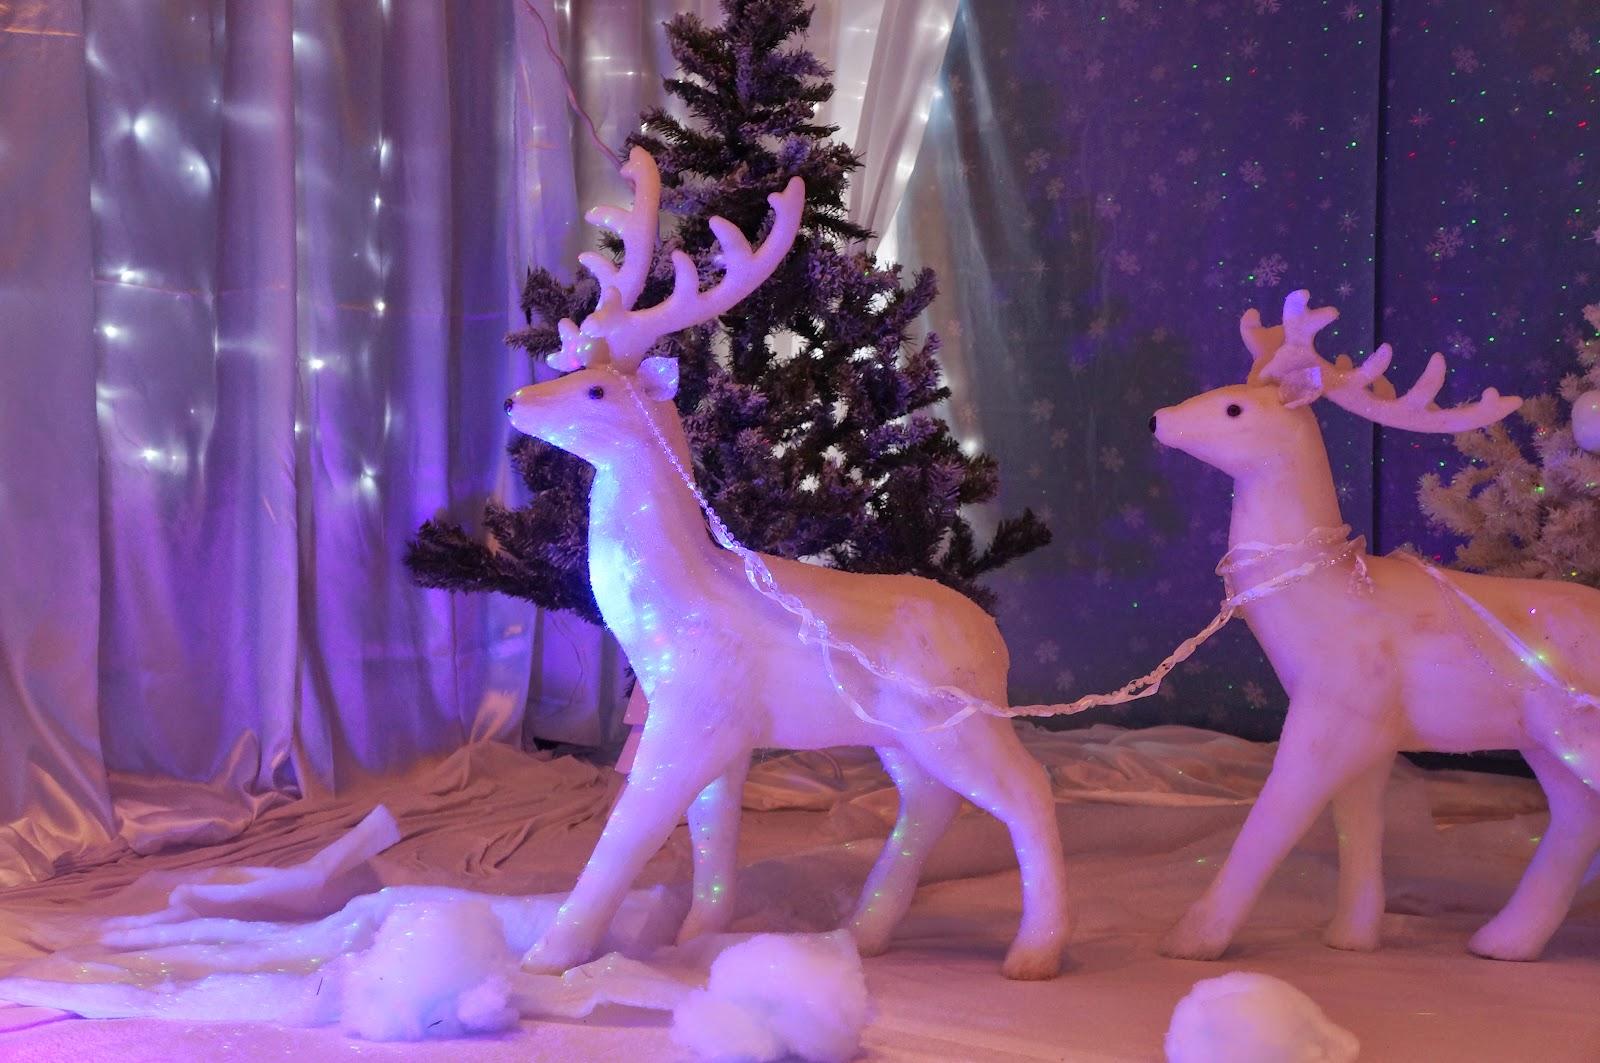 #742C9F Decorateur Vitrines Noel/Festidomi: DECORATIONS VITRINES  5483 decorations de noel pour entreprise 1600x1063 px @ aertt.com